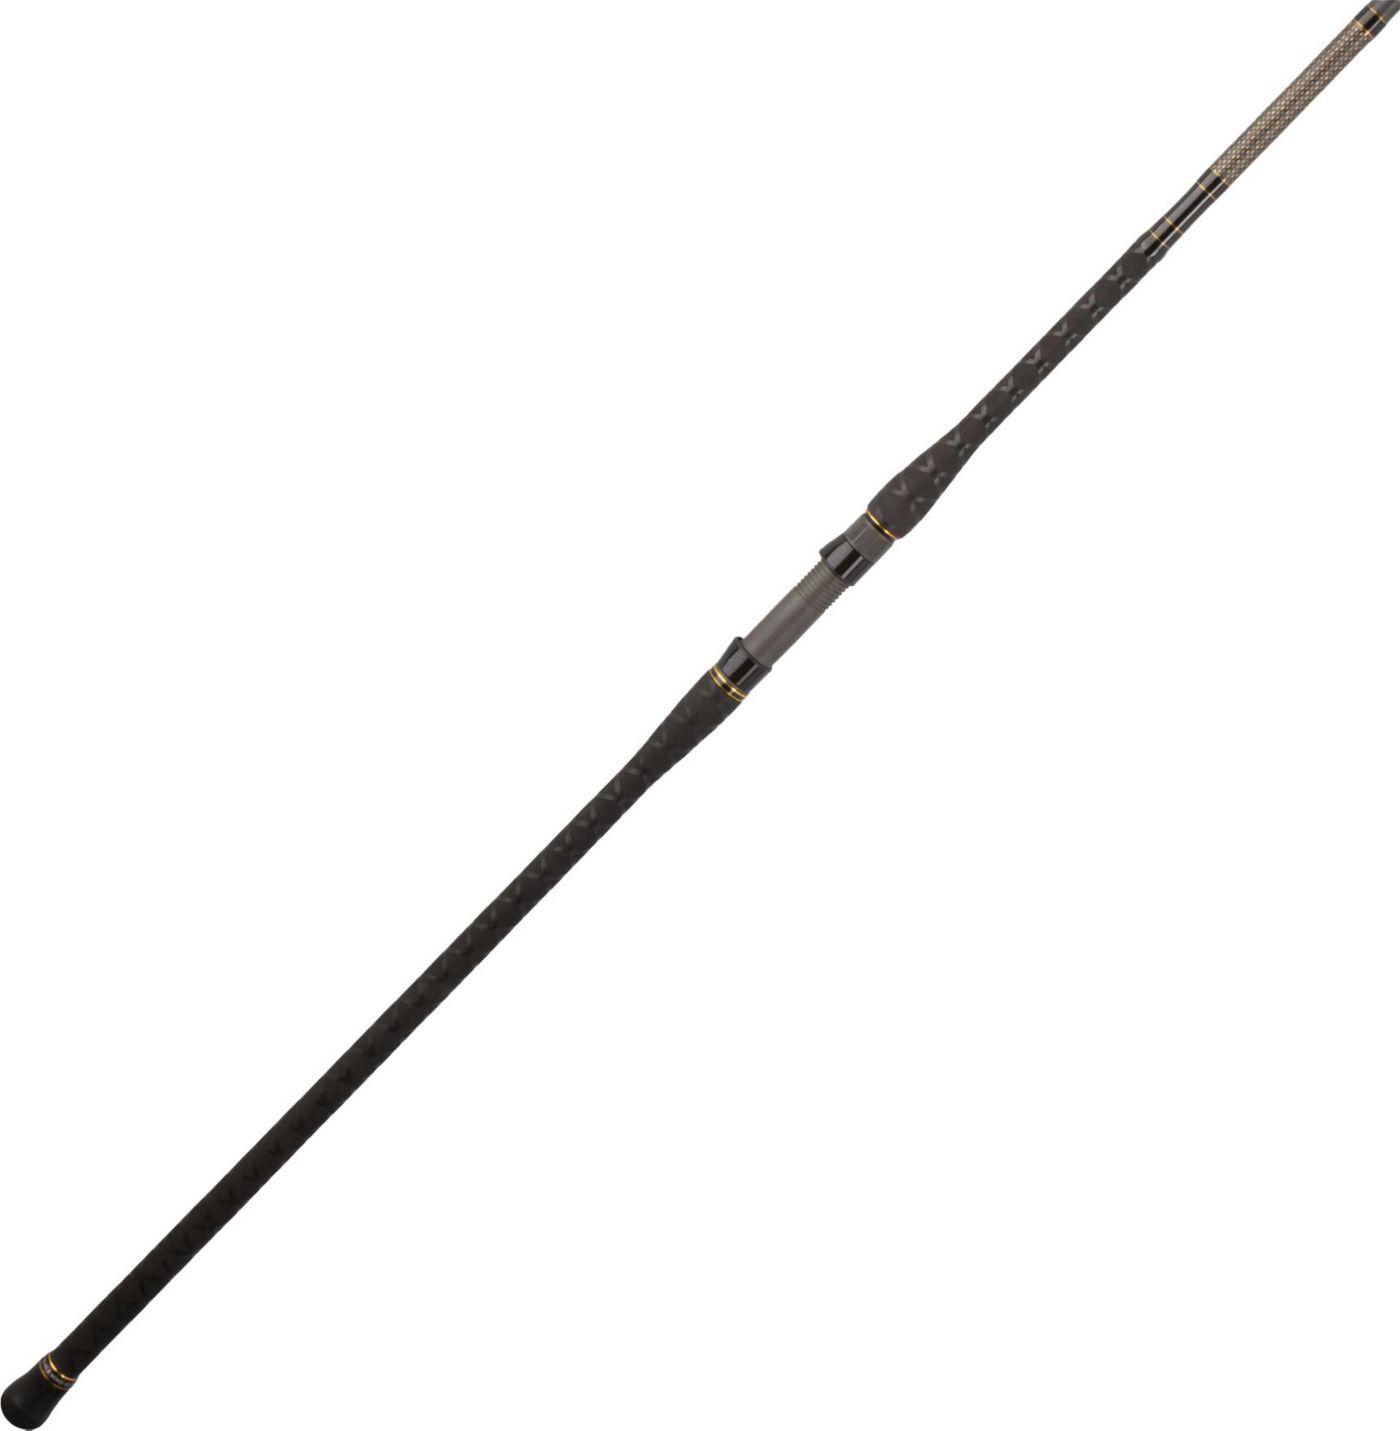 PENN Battalion Surf Casting Rod